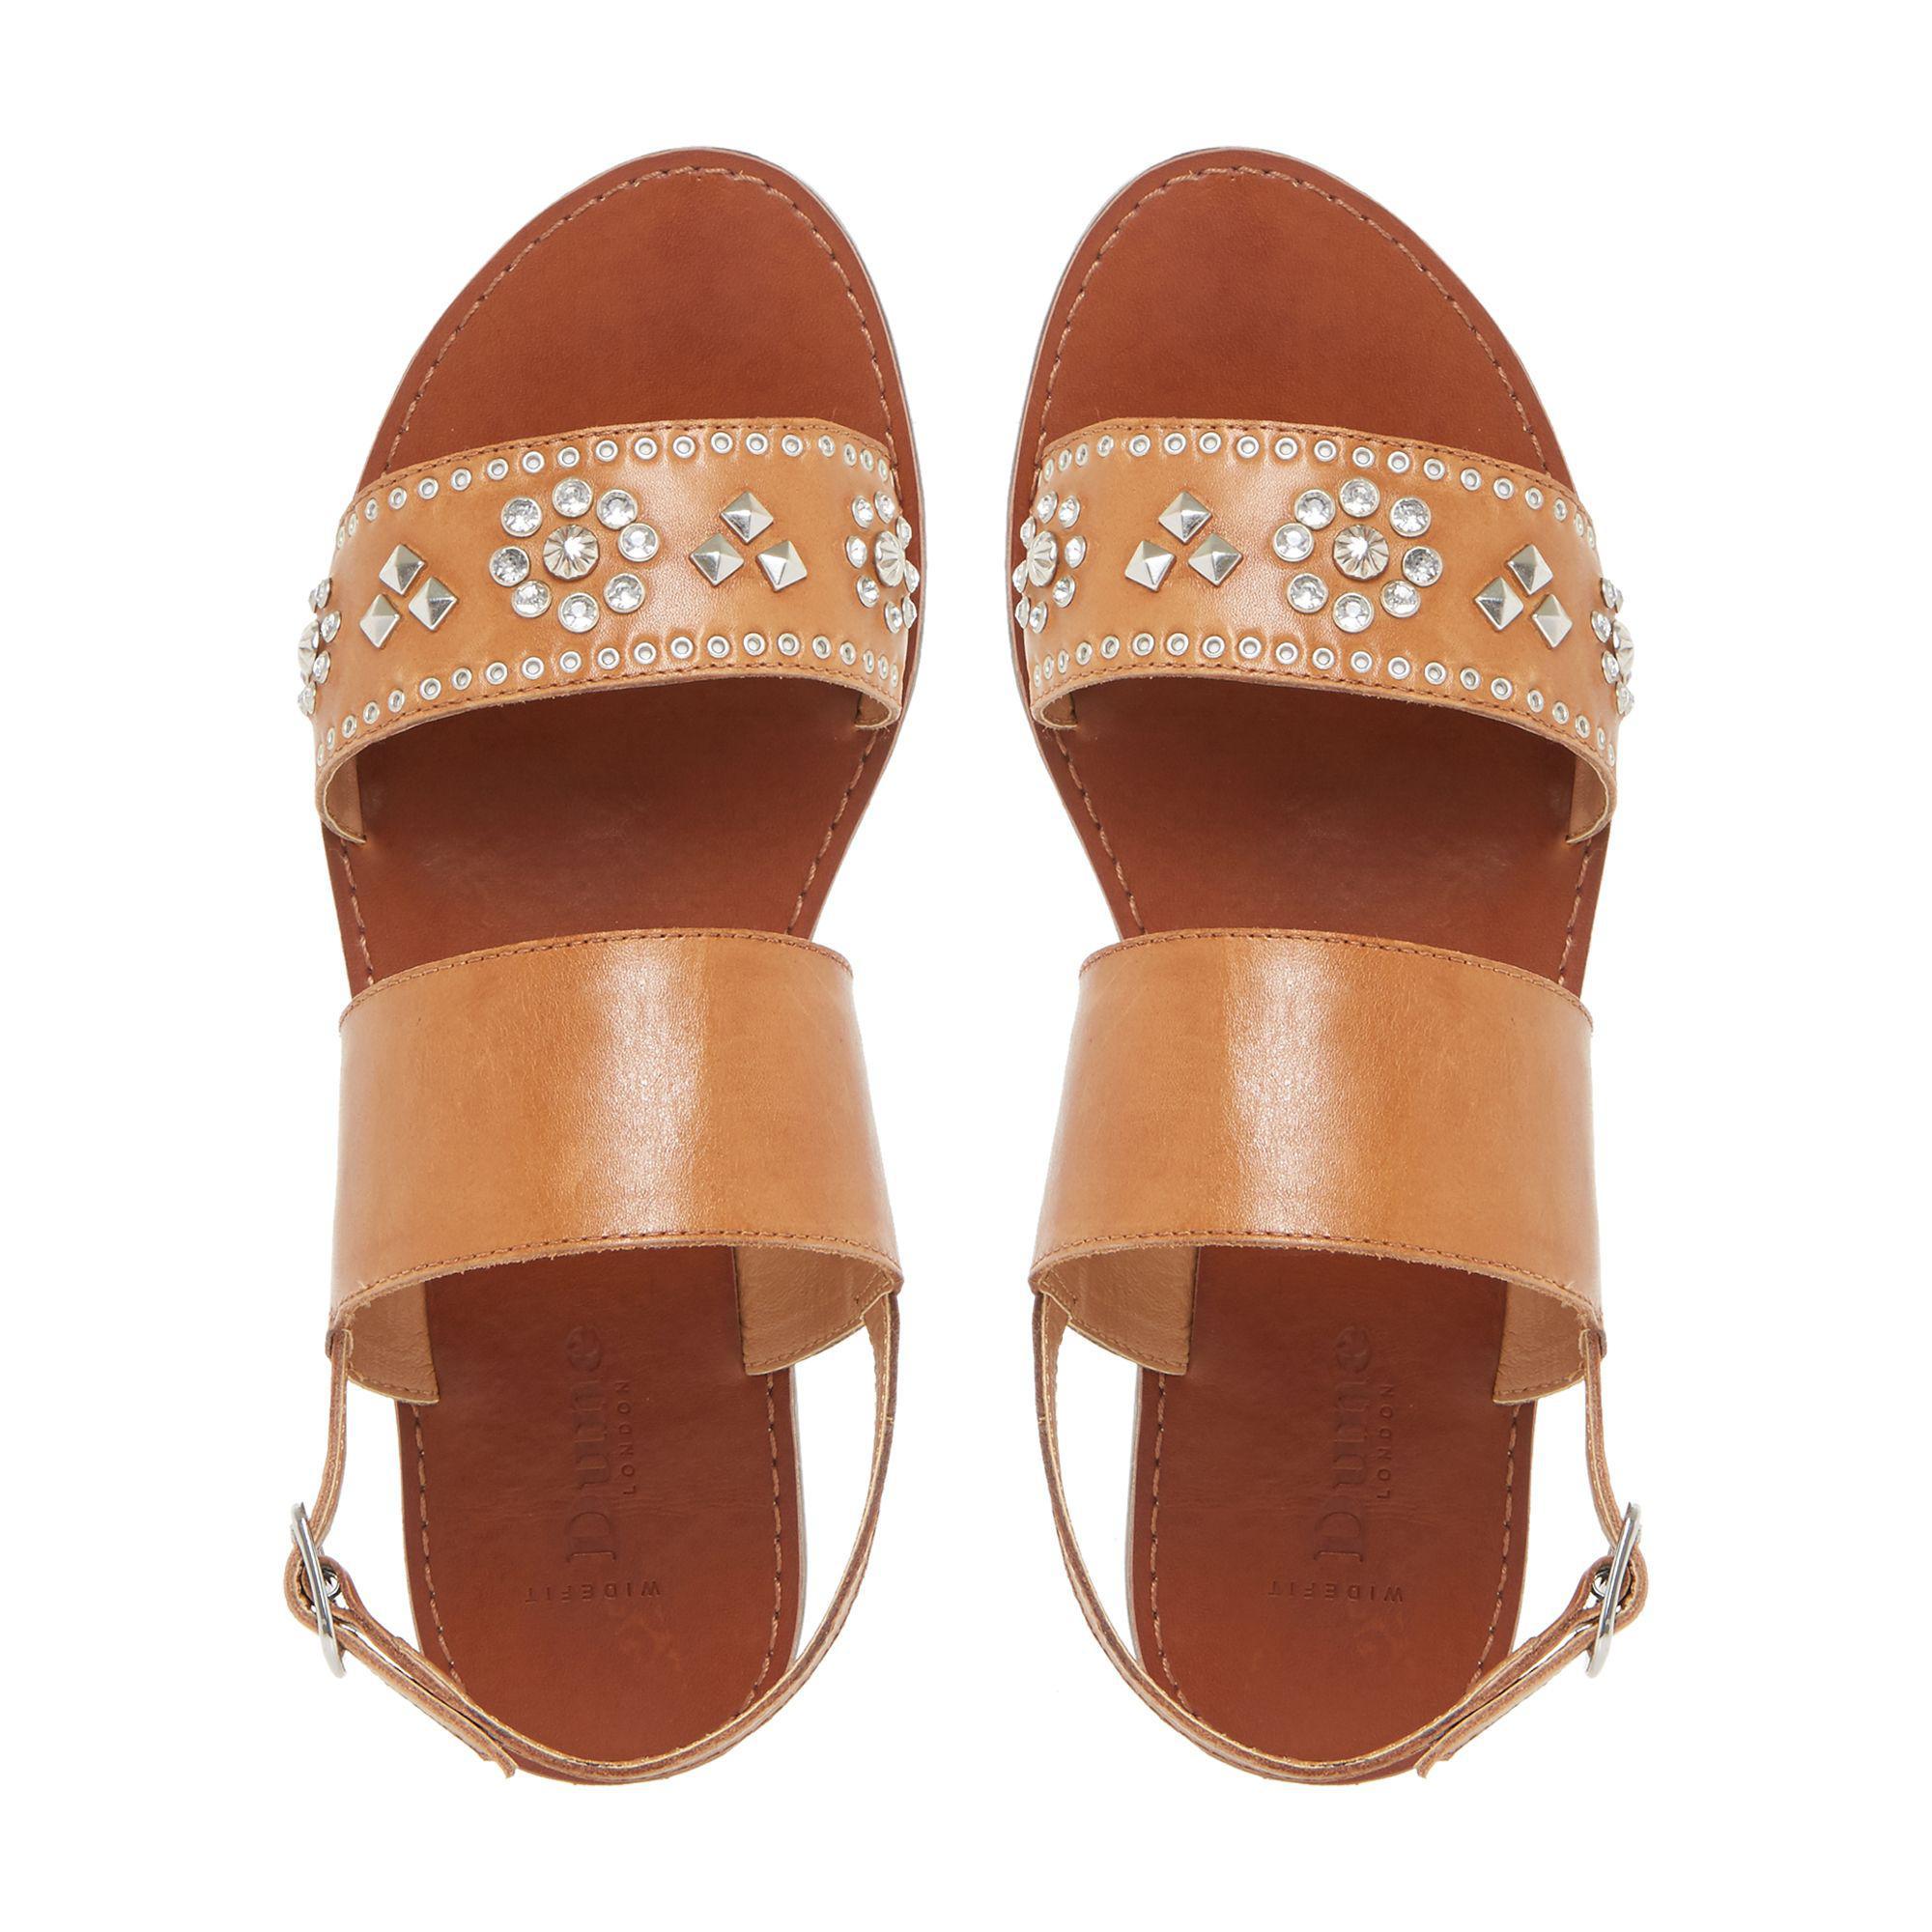 7bcbf640f81ac6 Dune - Brown Tan  w Luma  Slingback Stud And Diamante Flat Sandals - Lyst.  View fullscreen